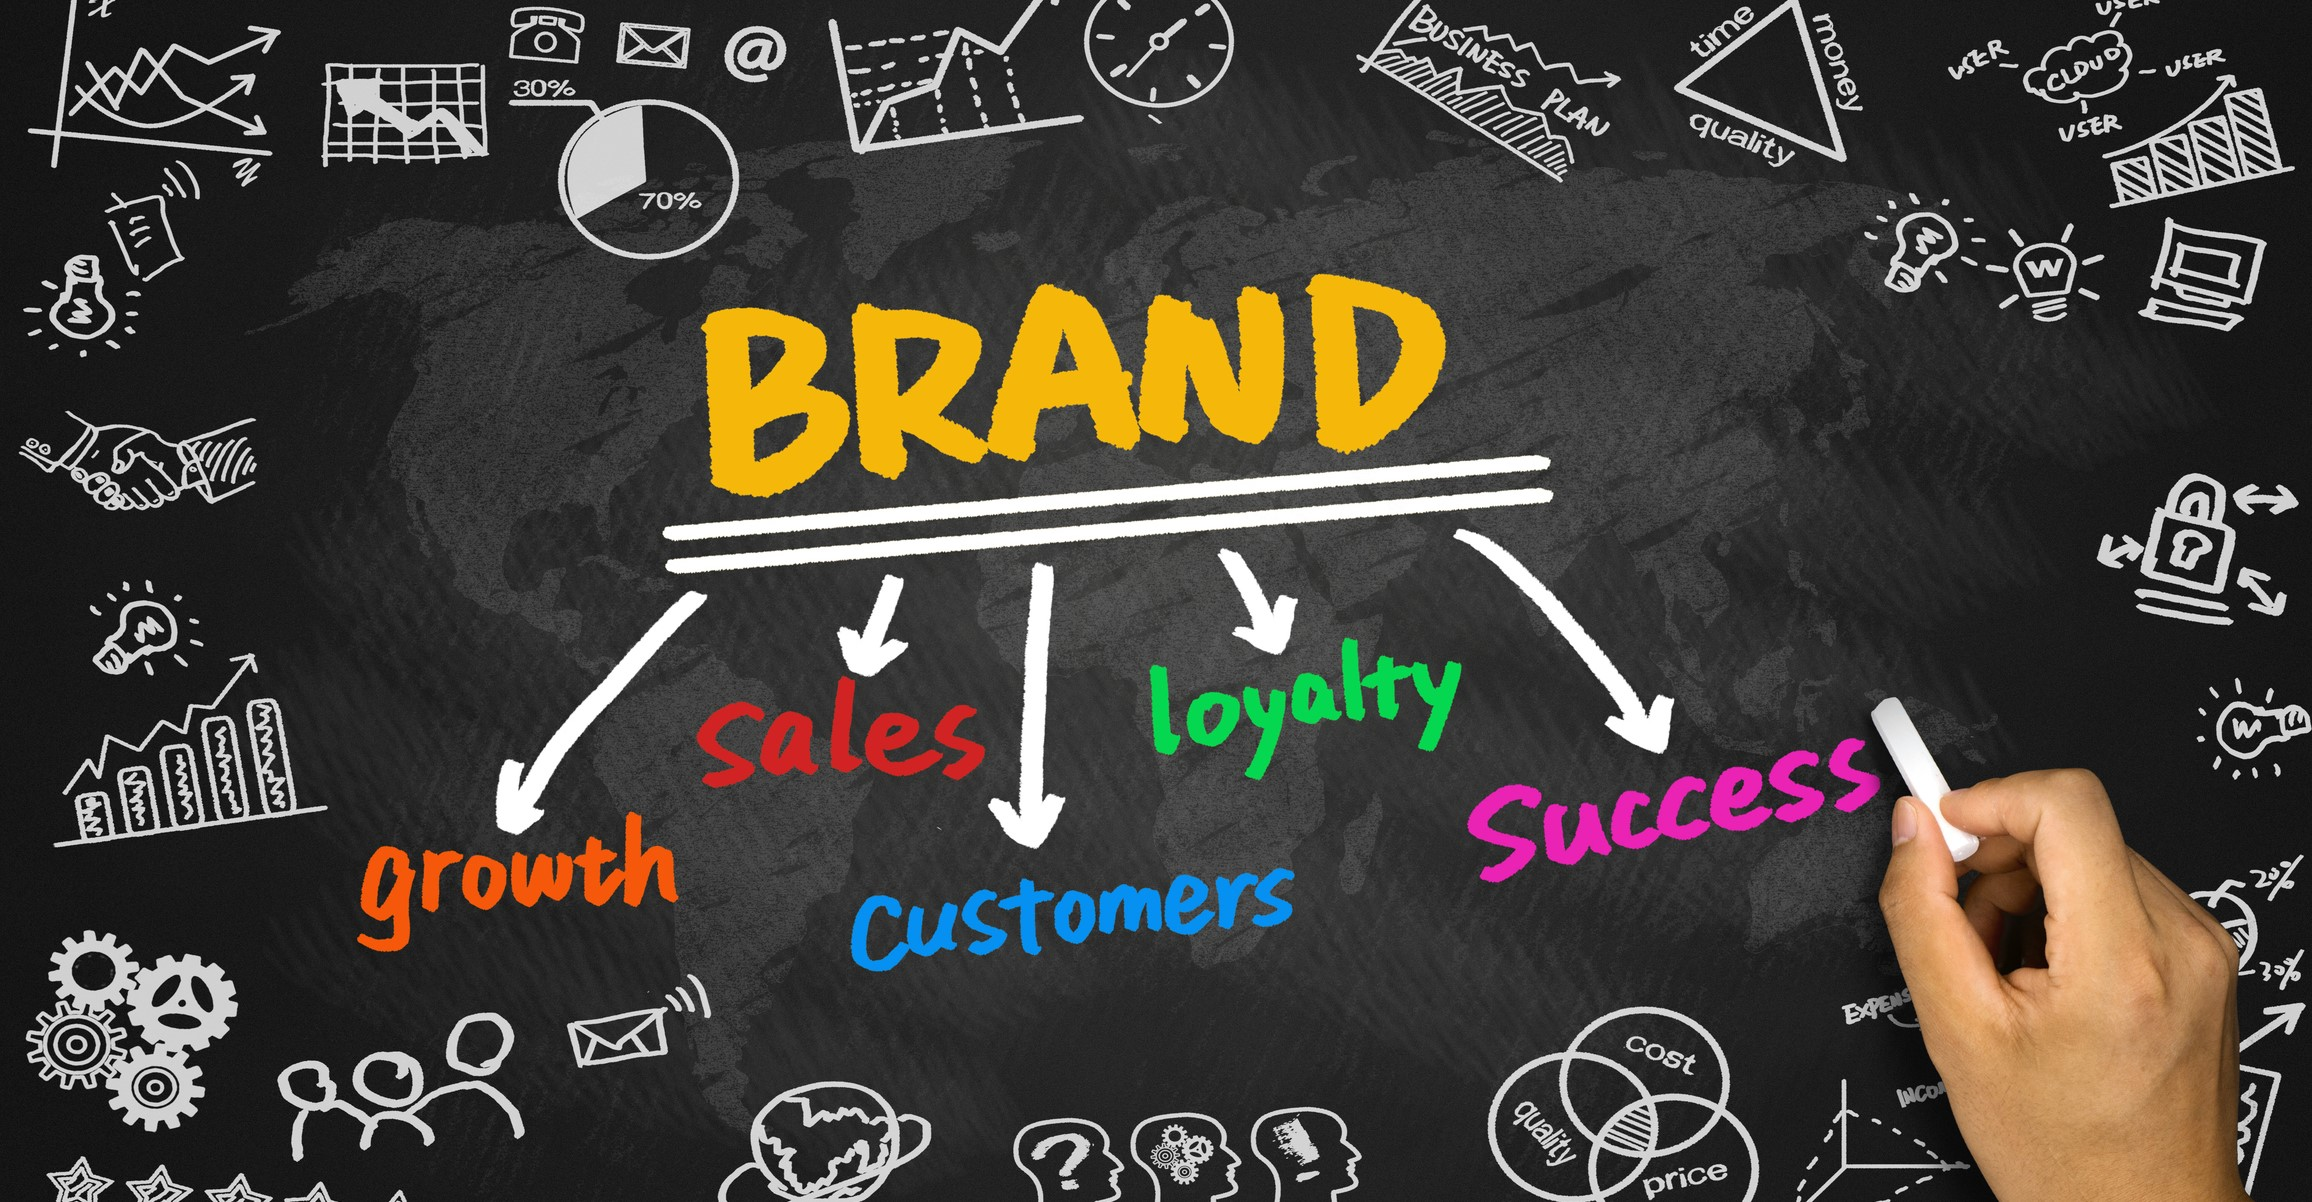 predictive analytics and customer loyalty